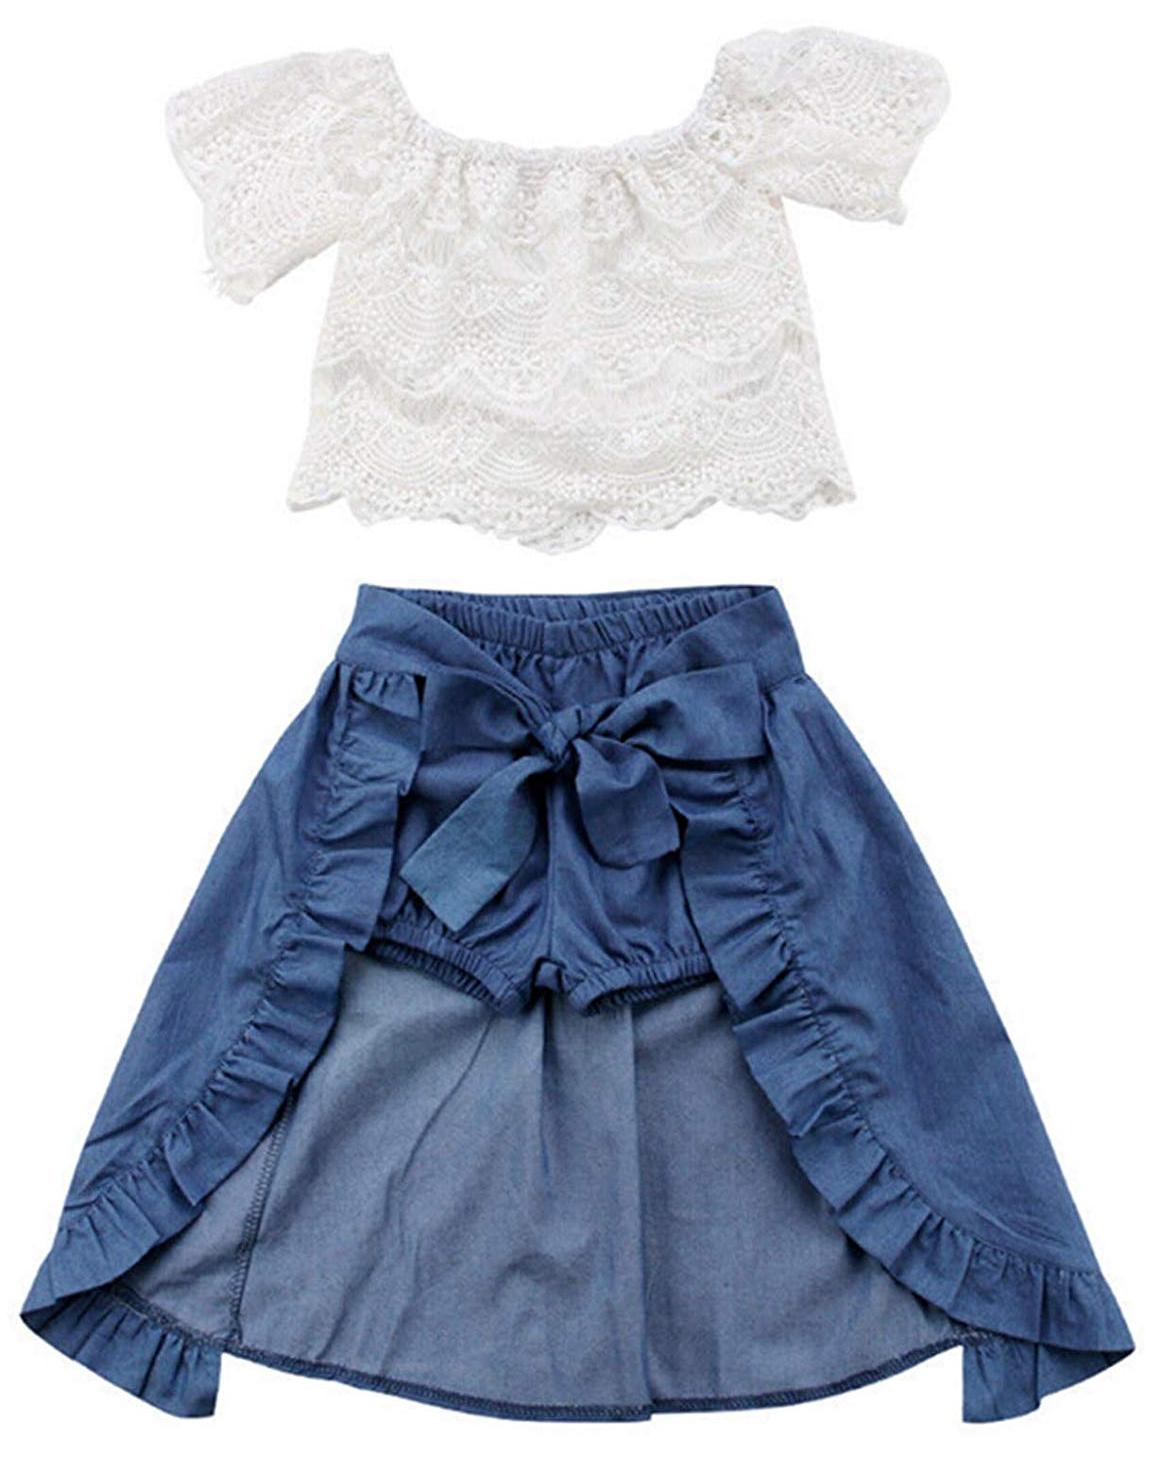 UK Toddler Kids Baby Girl Strap Tops Crop Skirt Dress 2PCS Outfit Clothes Summer